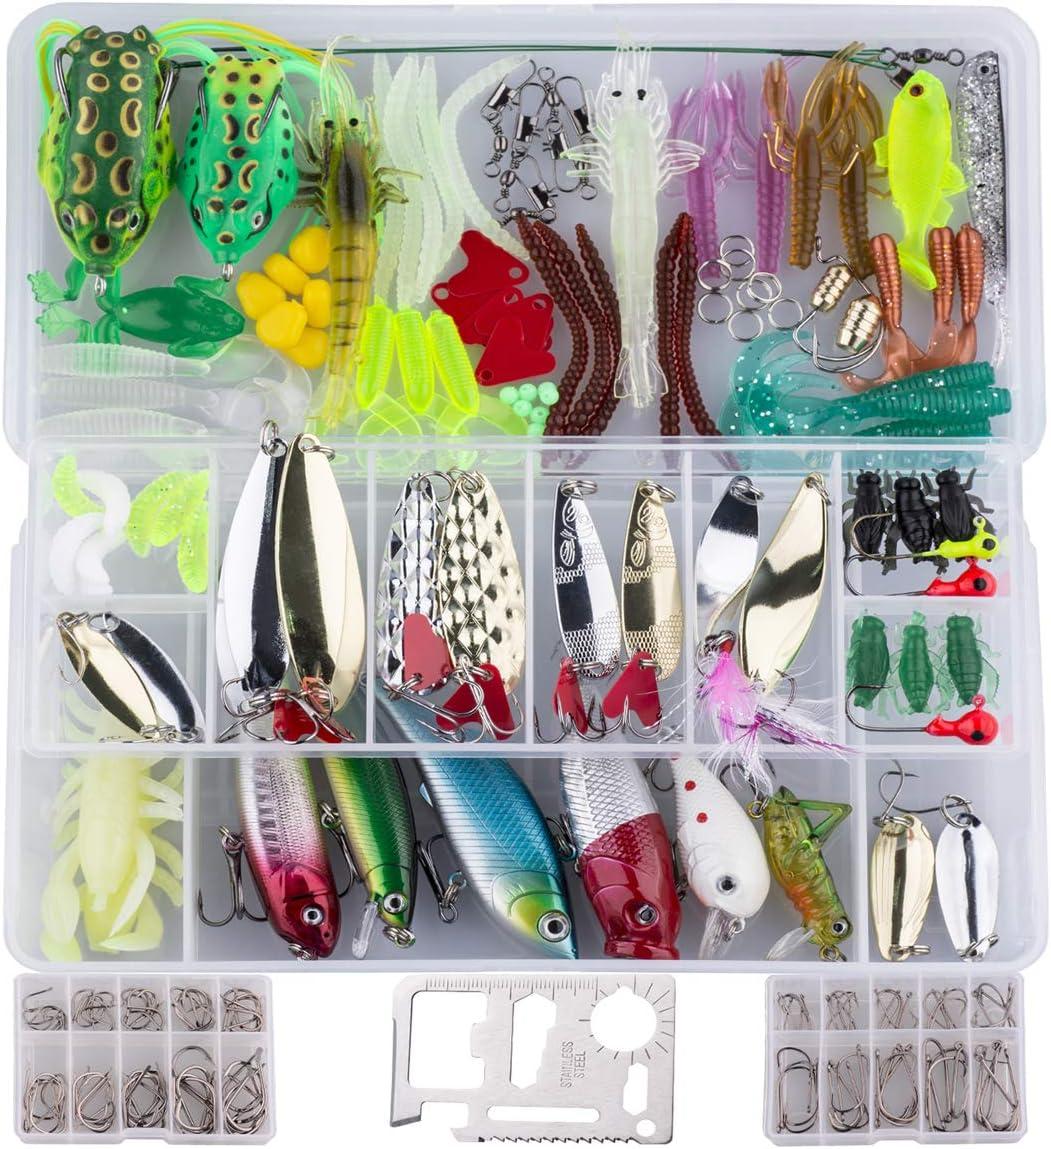 Bass Tackle Hook 4 colors  VIB Fishing Lures Jig Head  Metal Spoons  Crank Bait